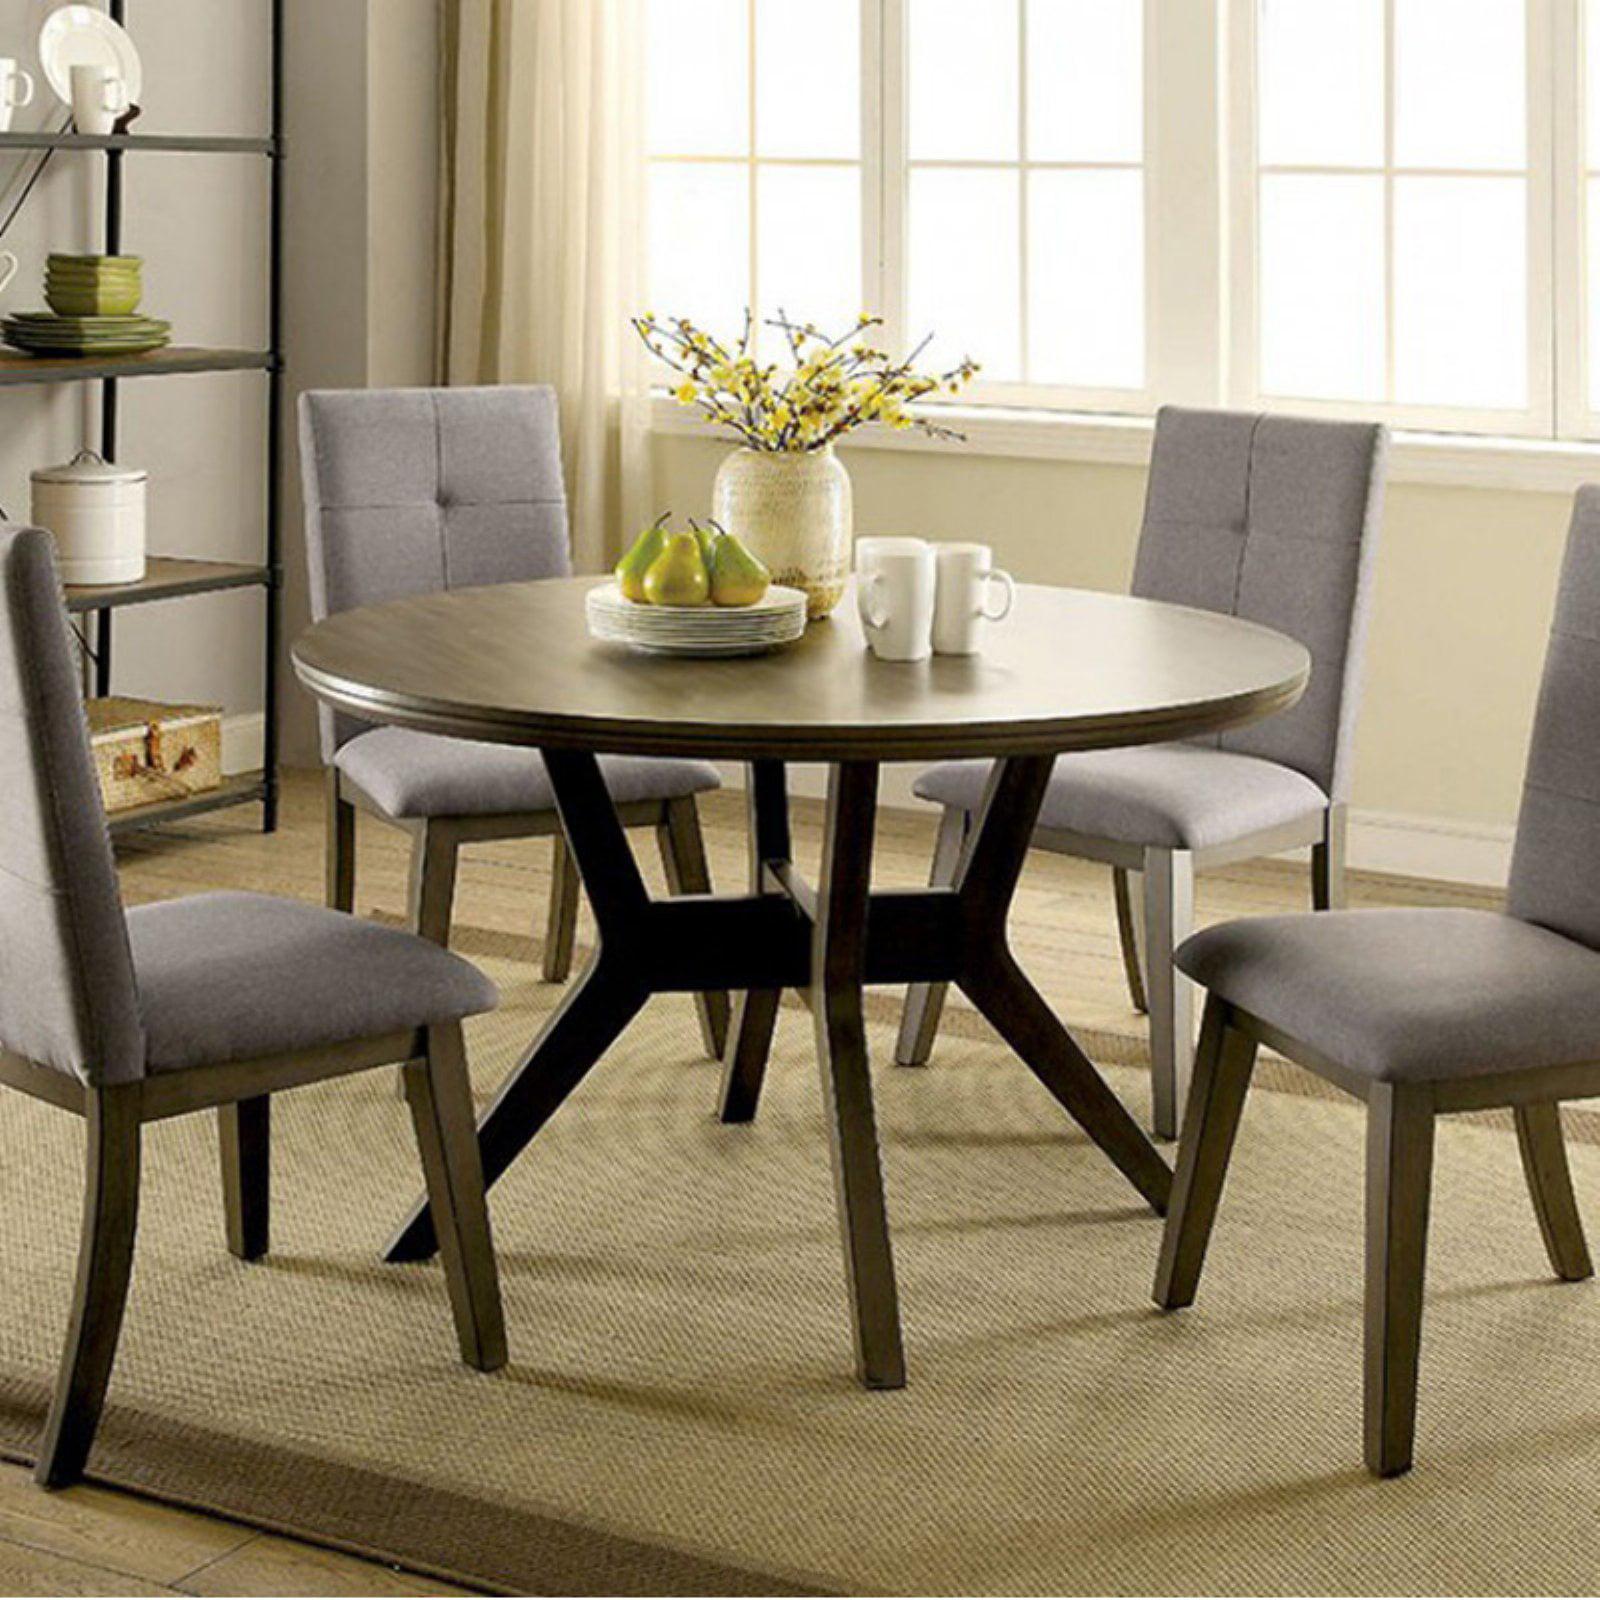 Abelone Mid-Century Modern Round Dining Table, Gray